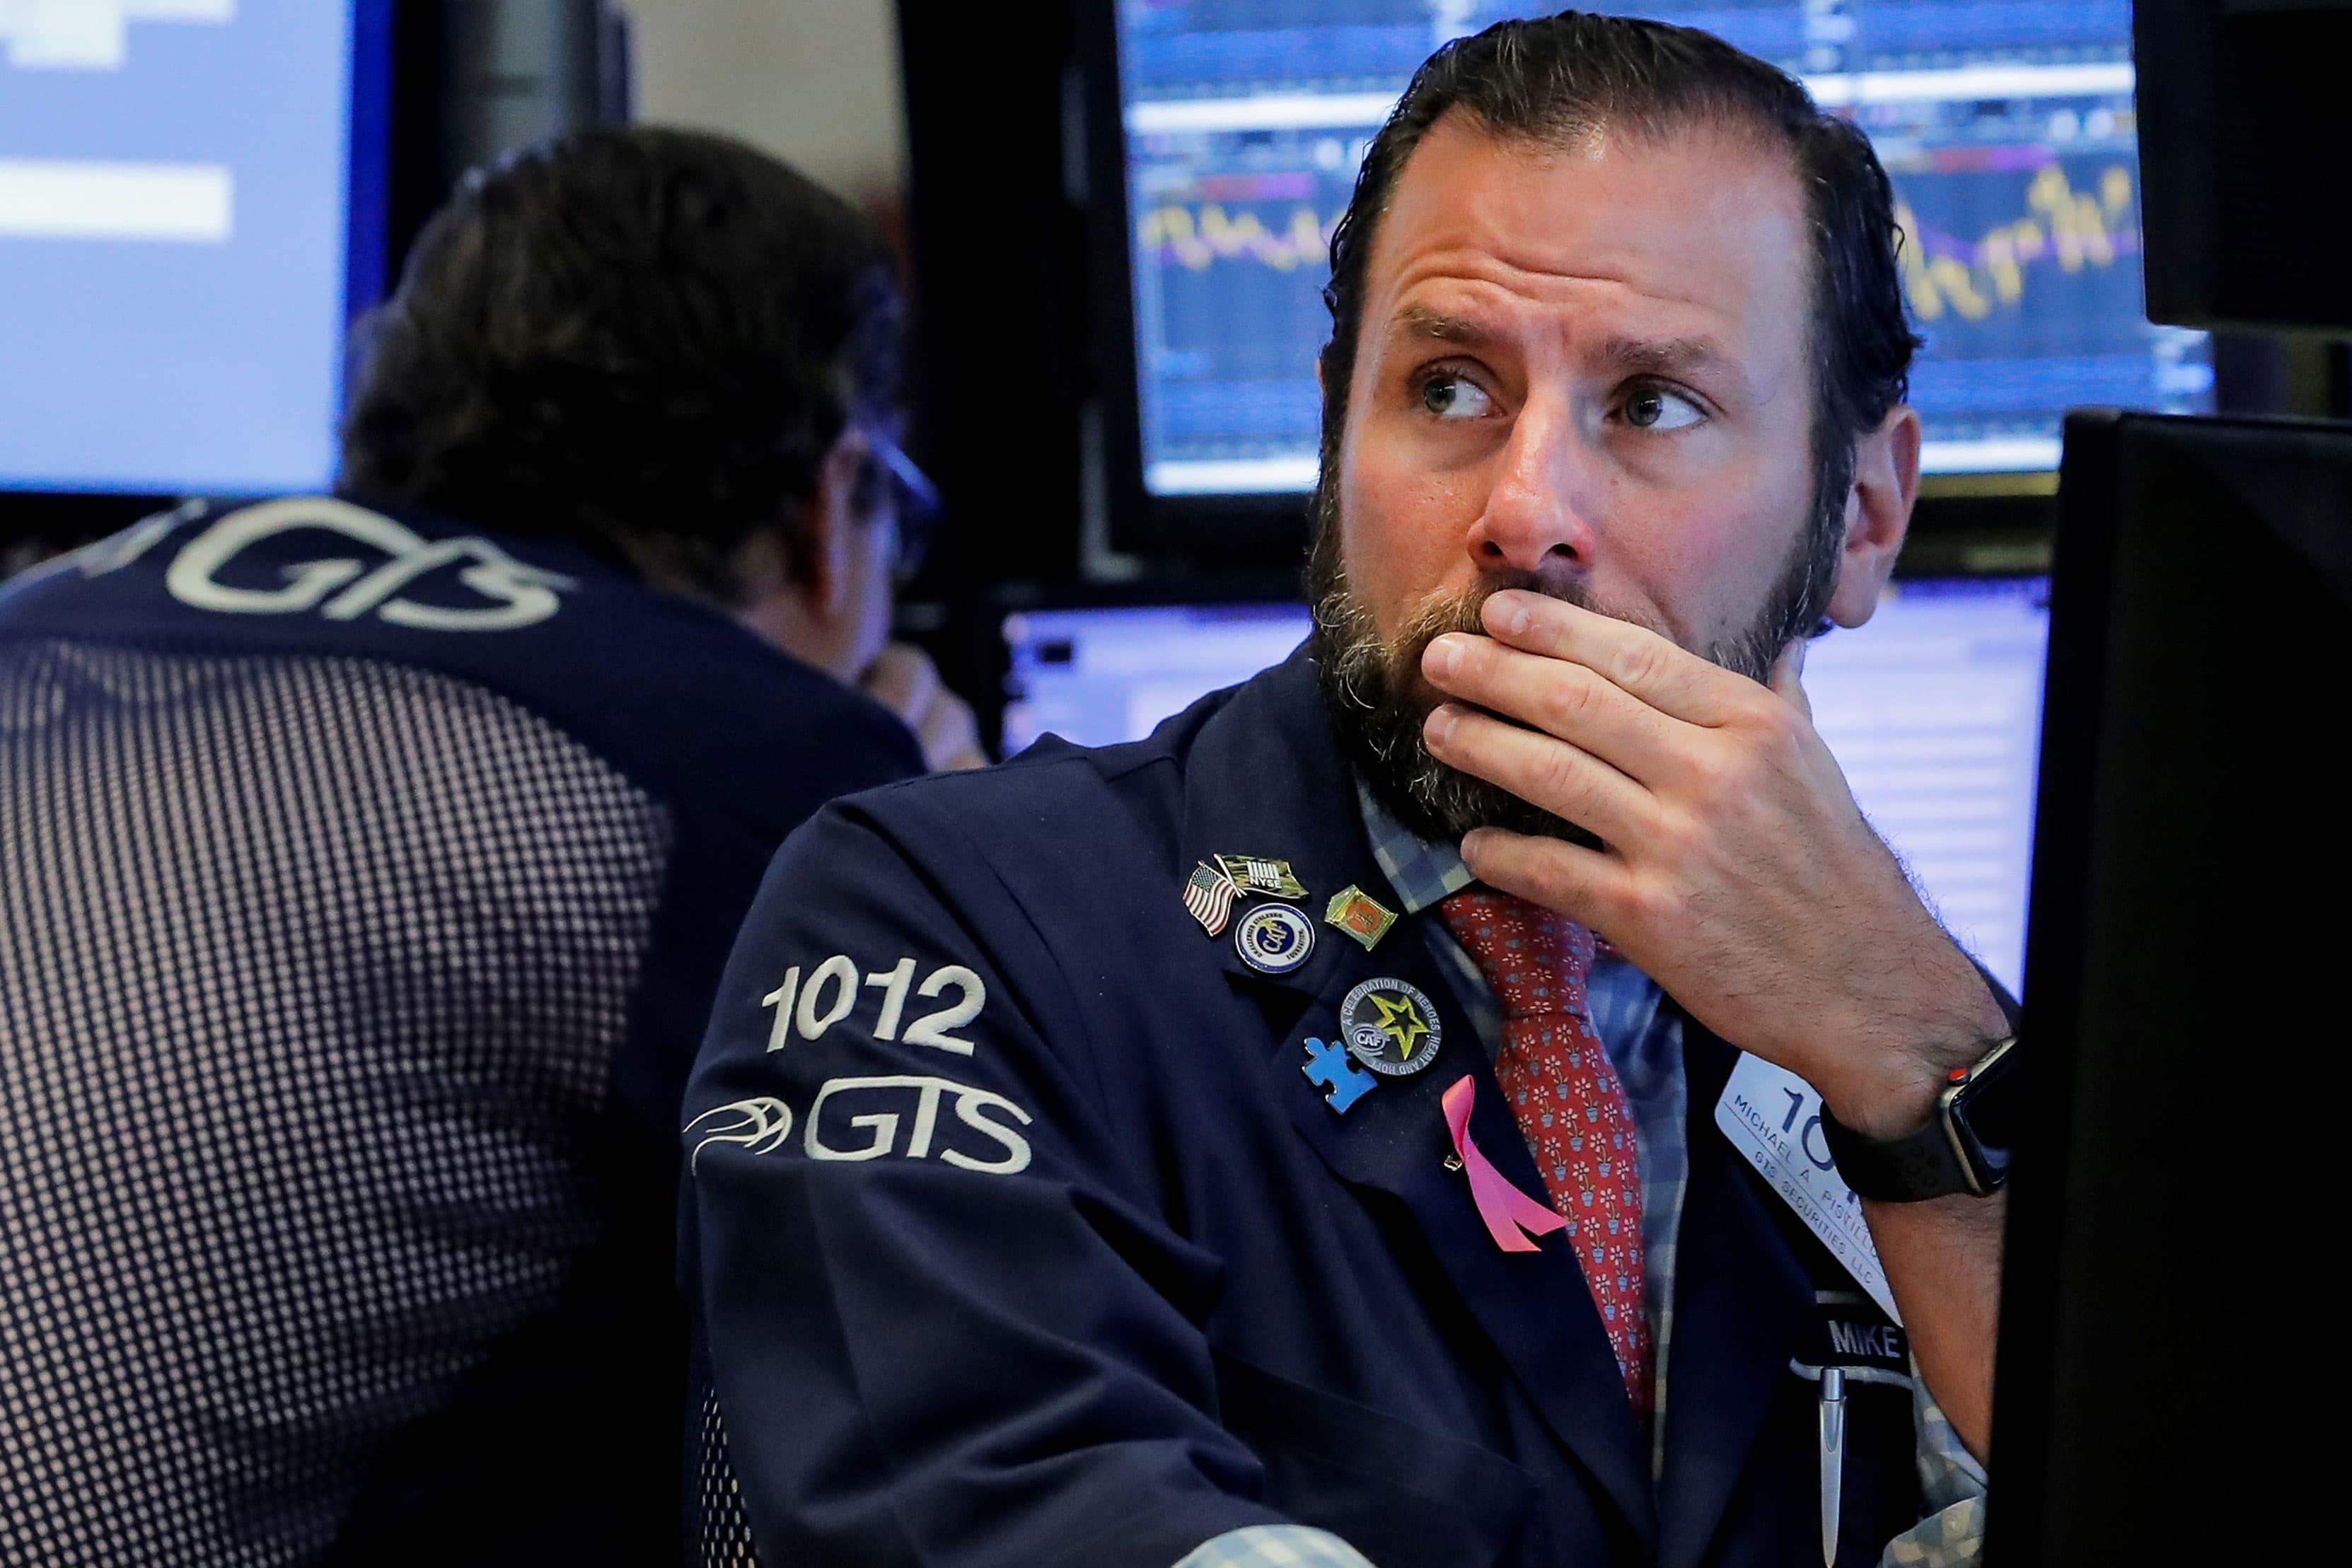 RT: NYSE trader worried concerned 181017